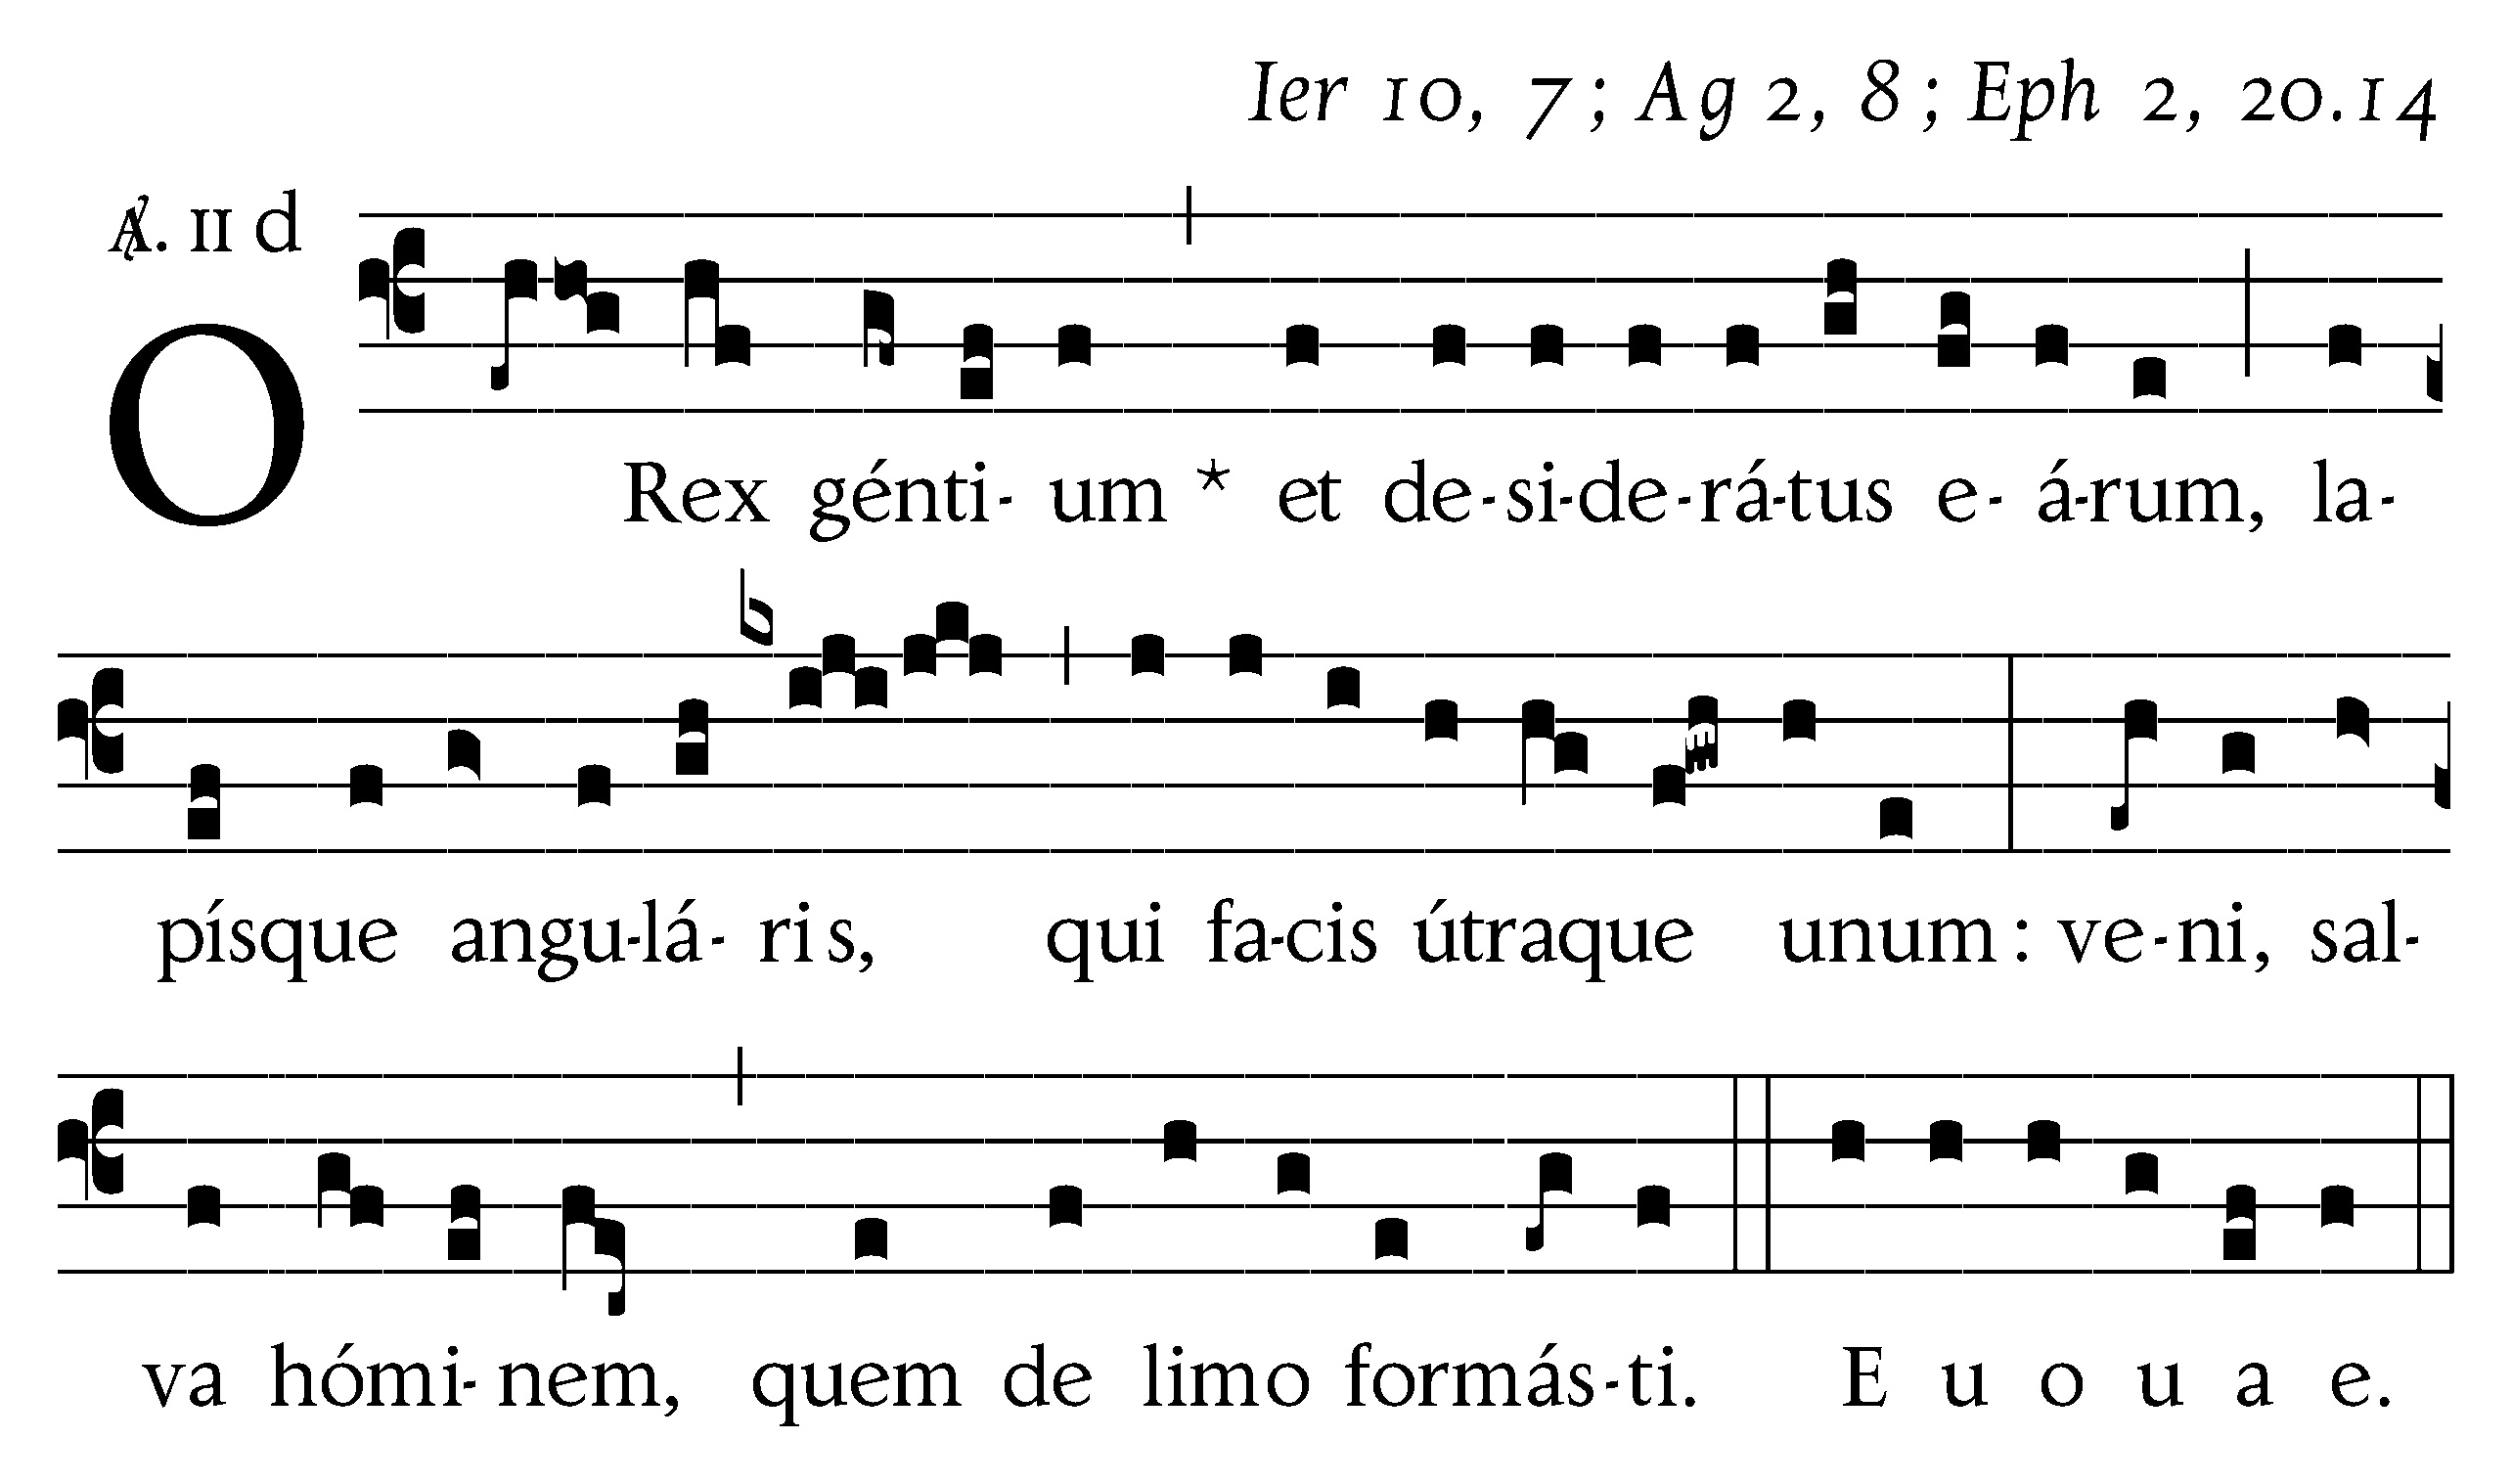 O Rex gentium copy